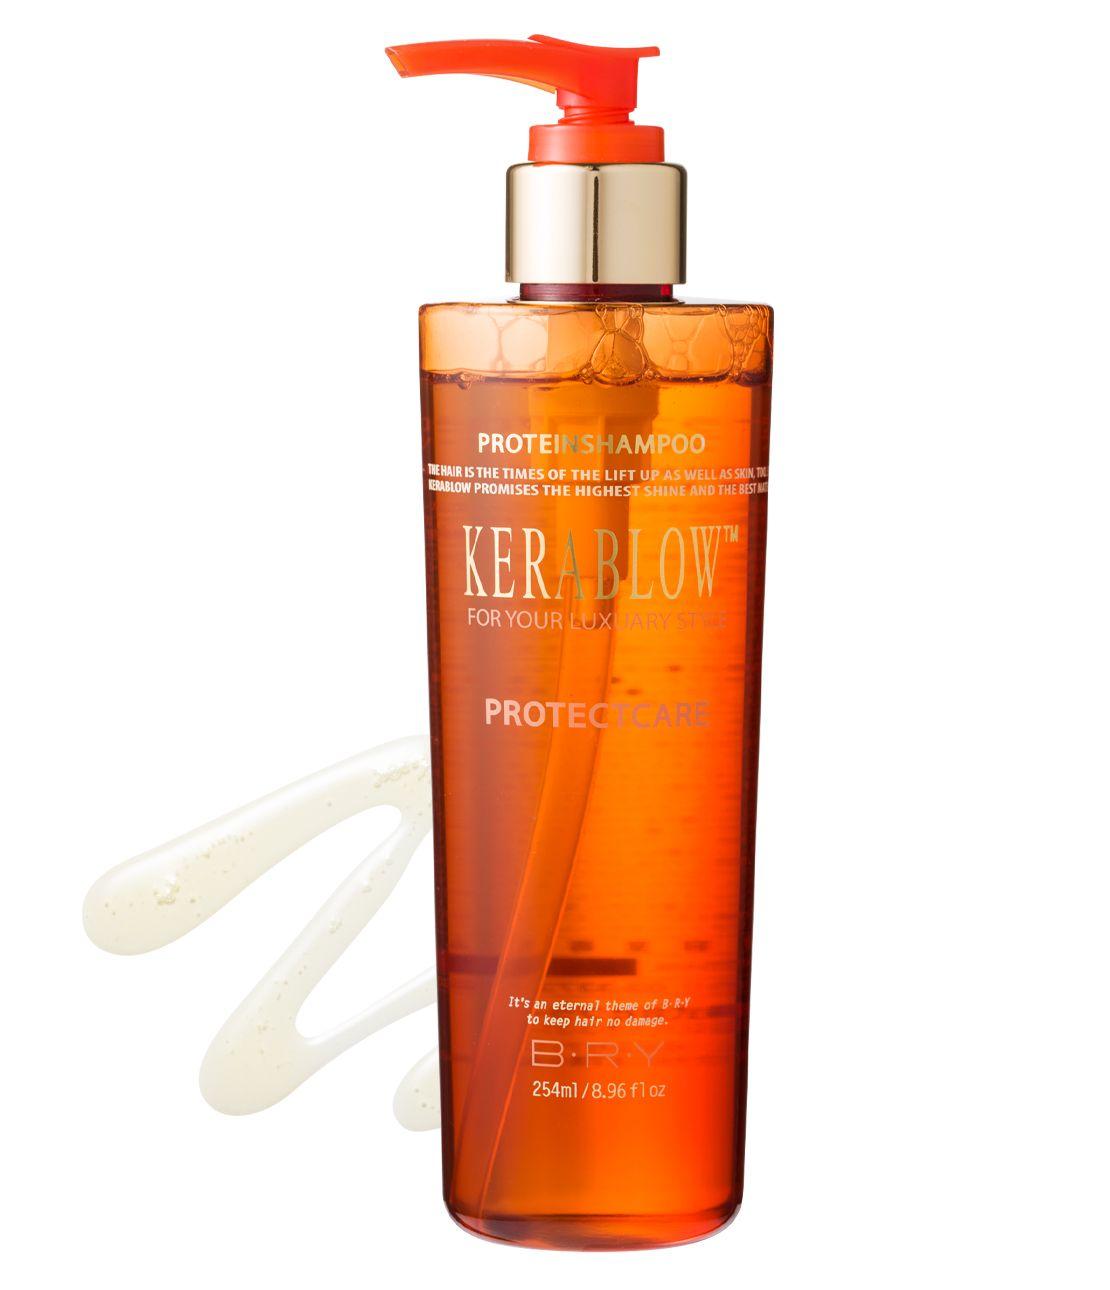 Kera blow protect care protein shampoo